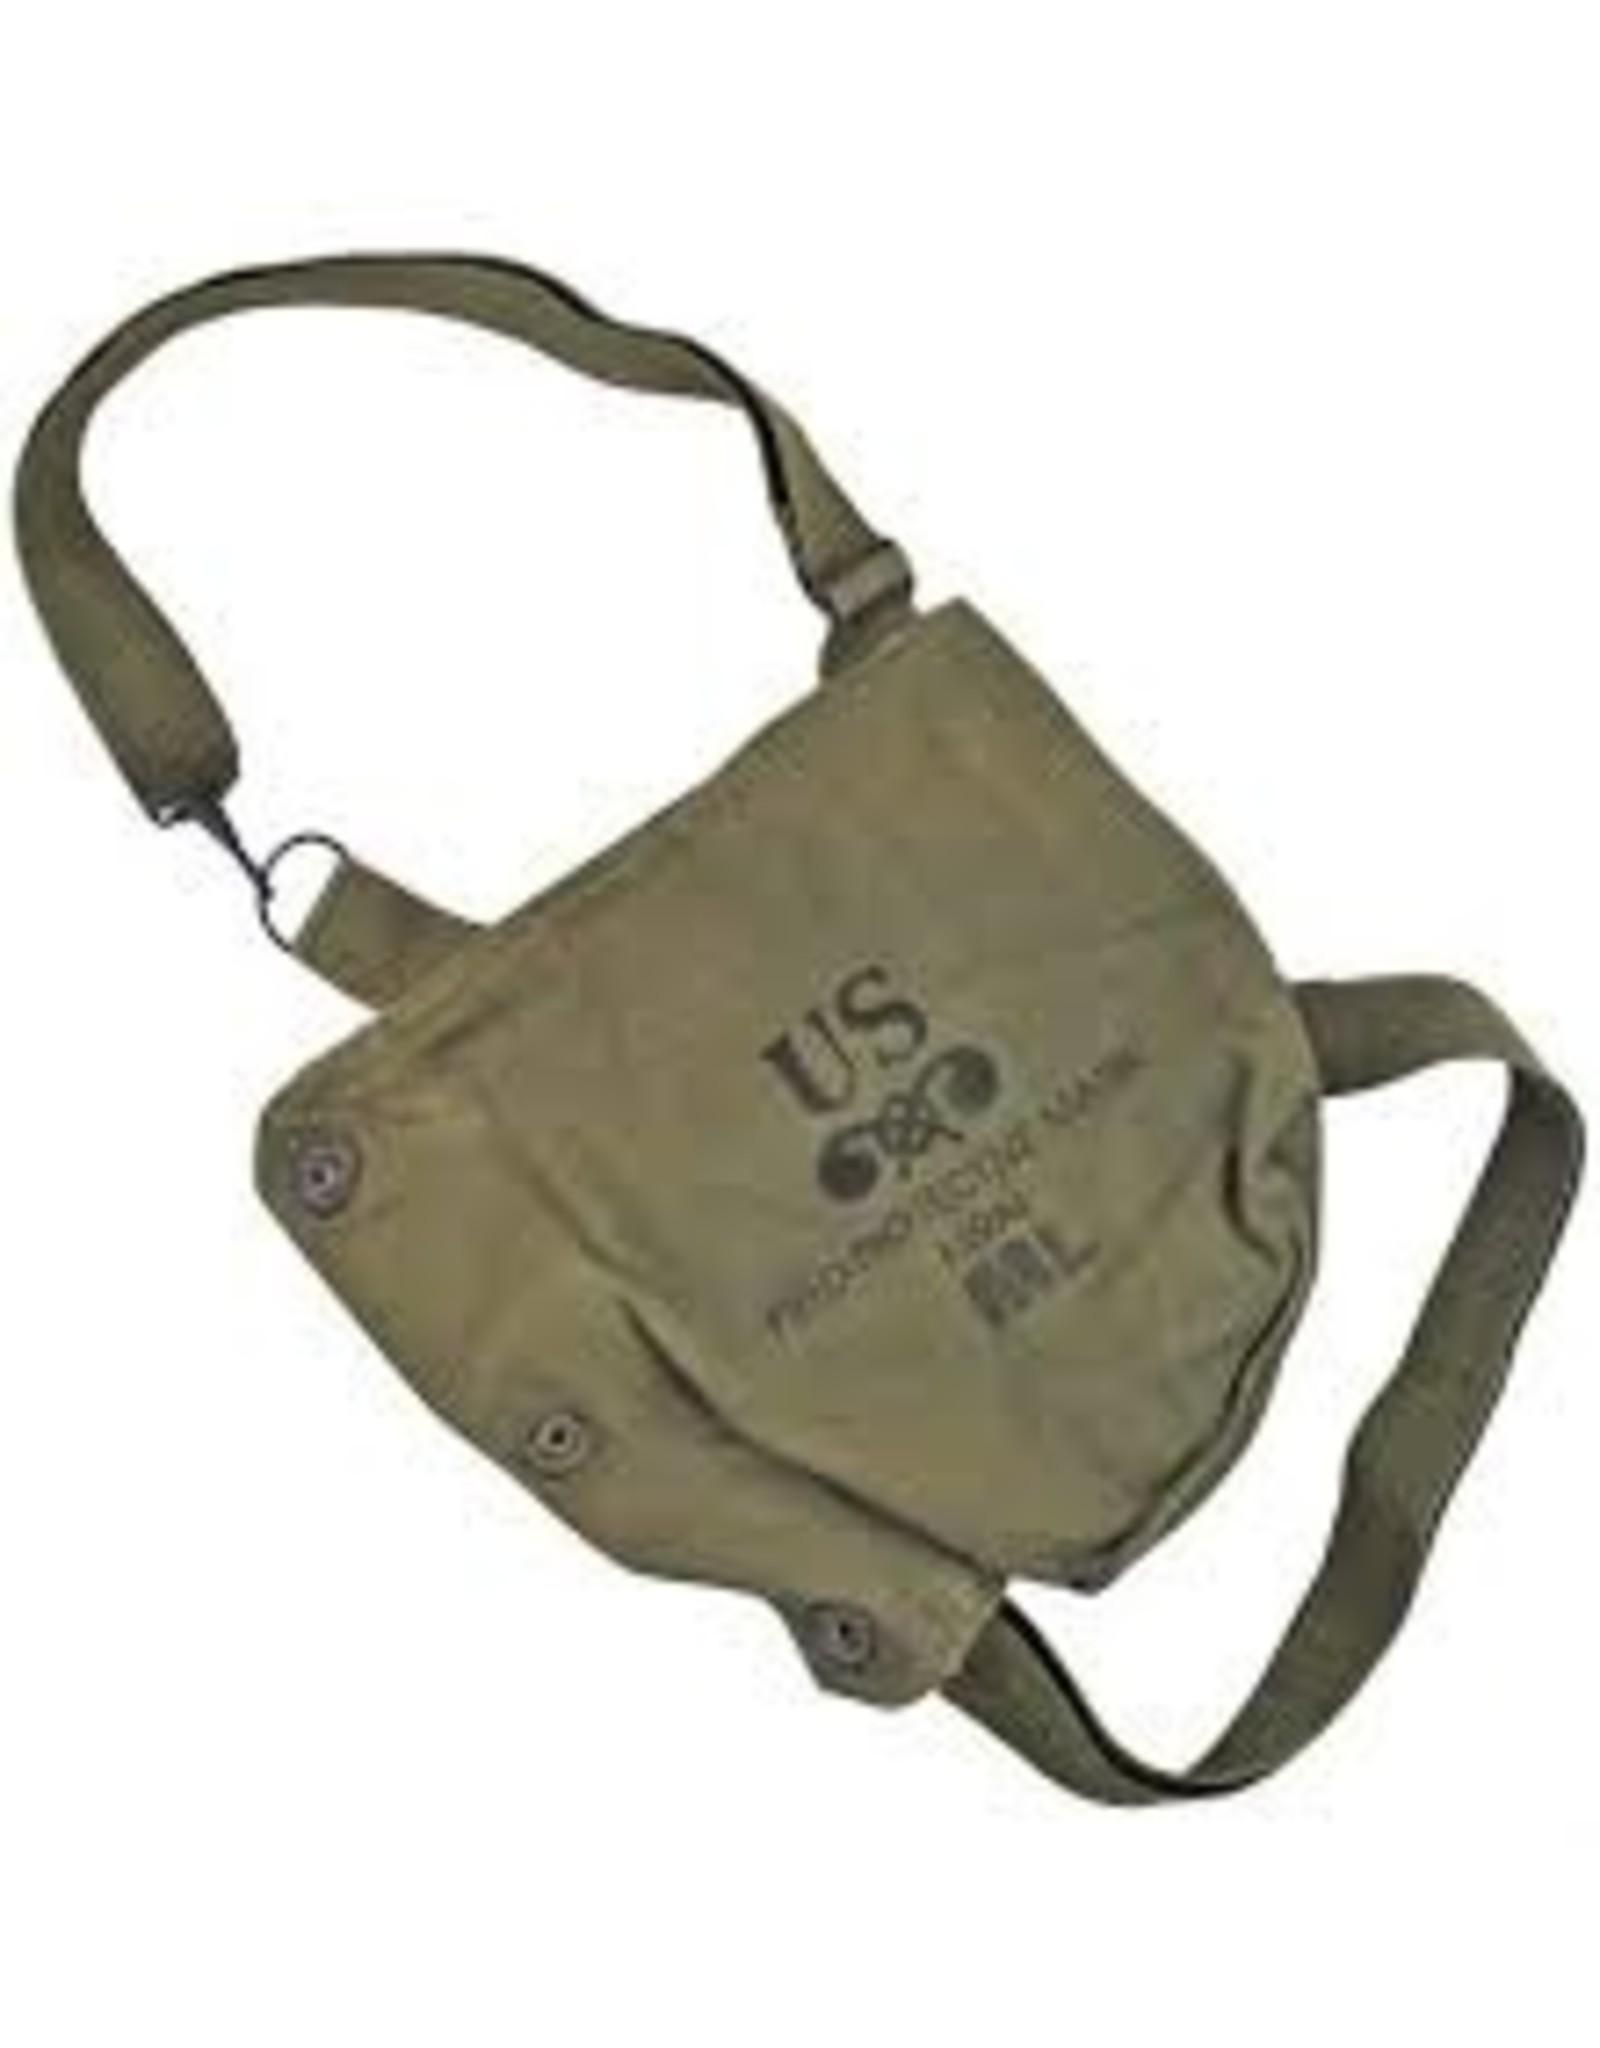 FIELD PROTECTIVE MASK BAG